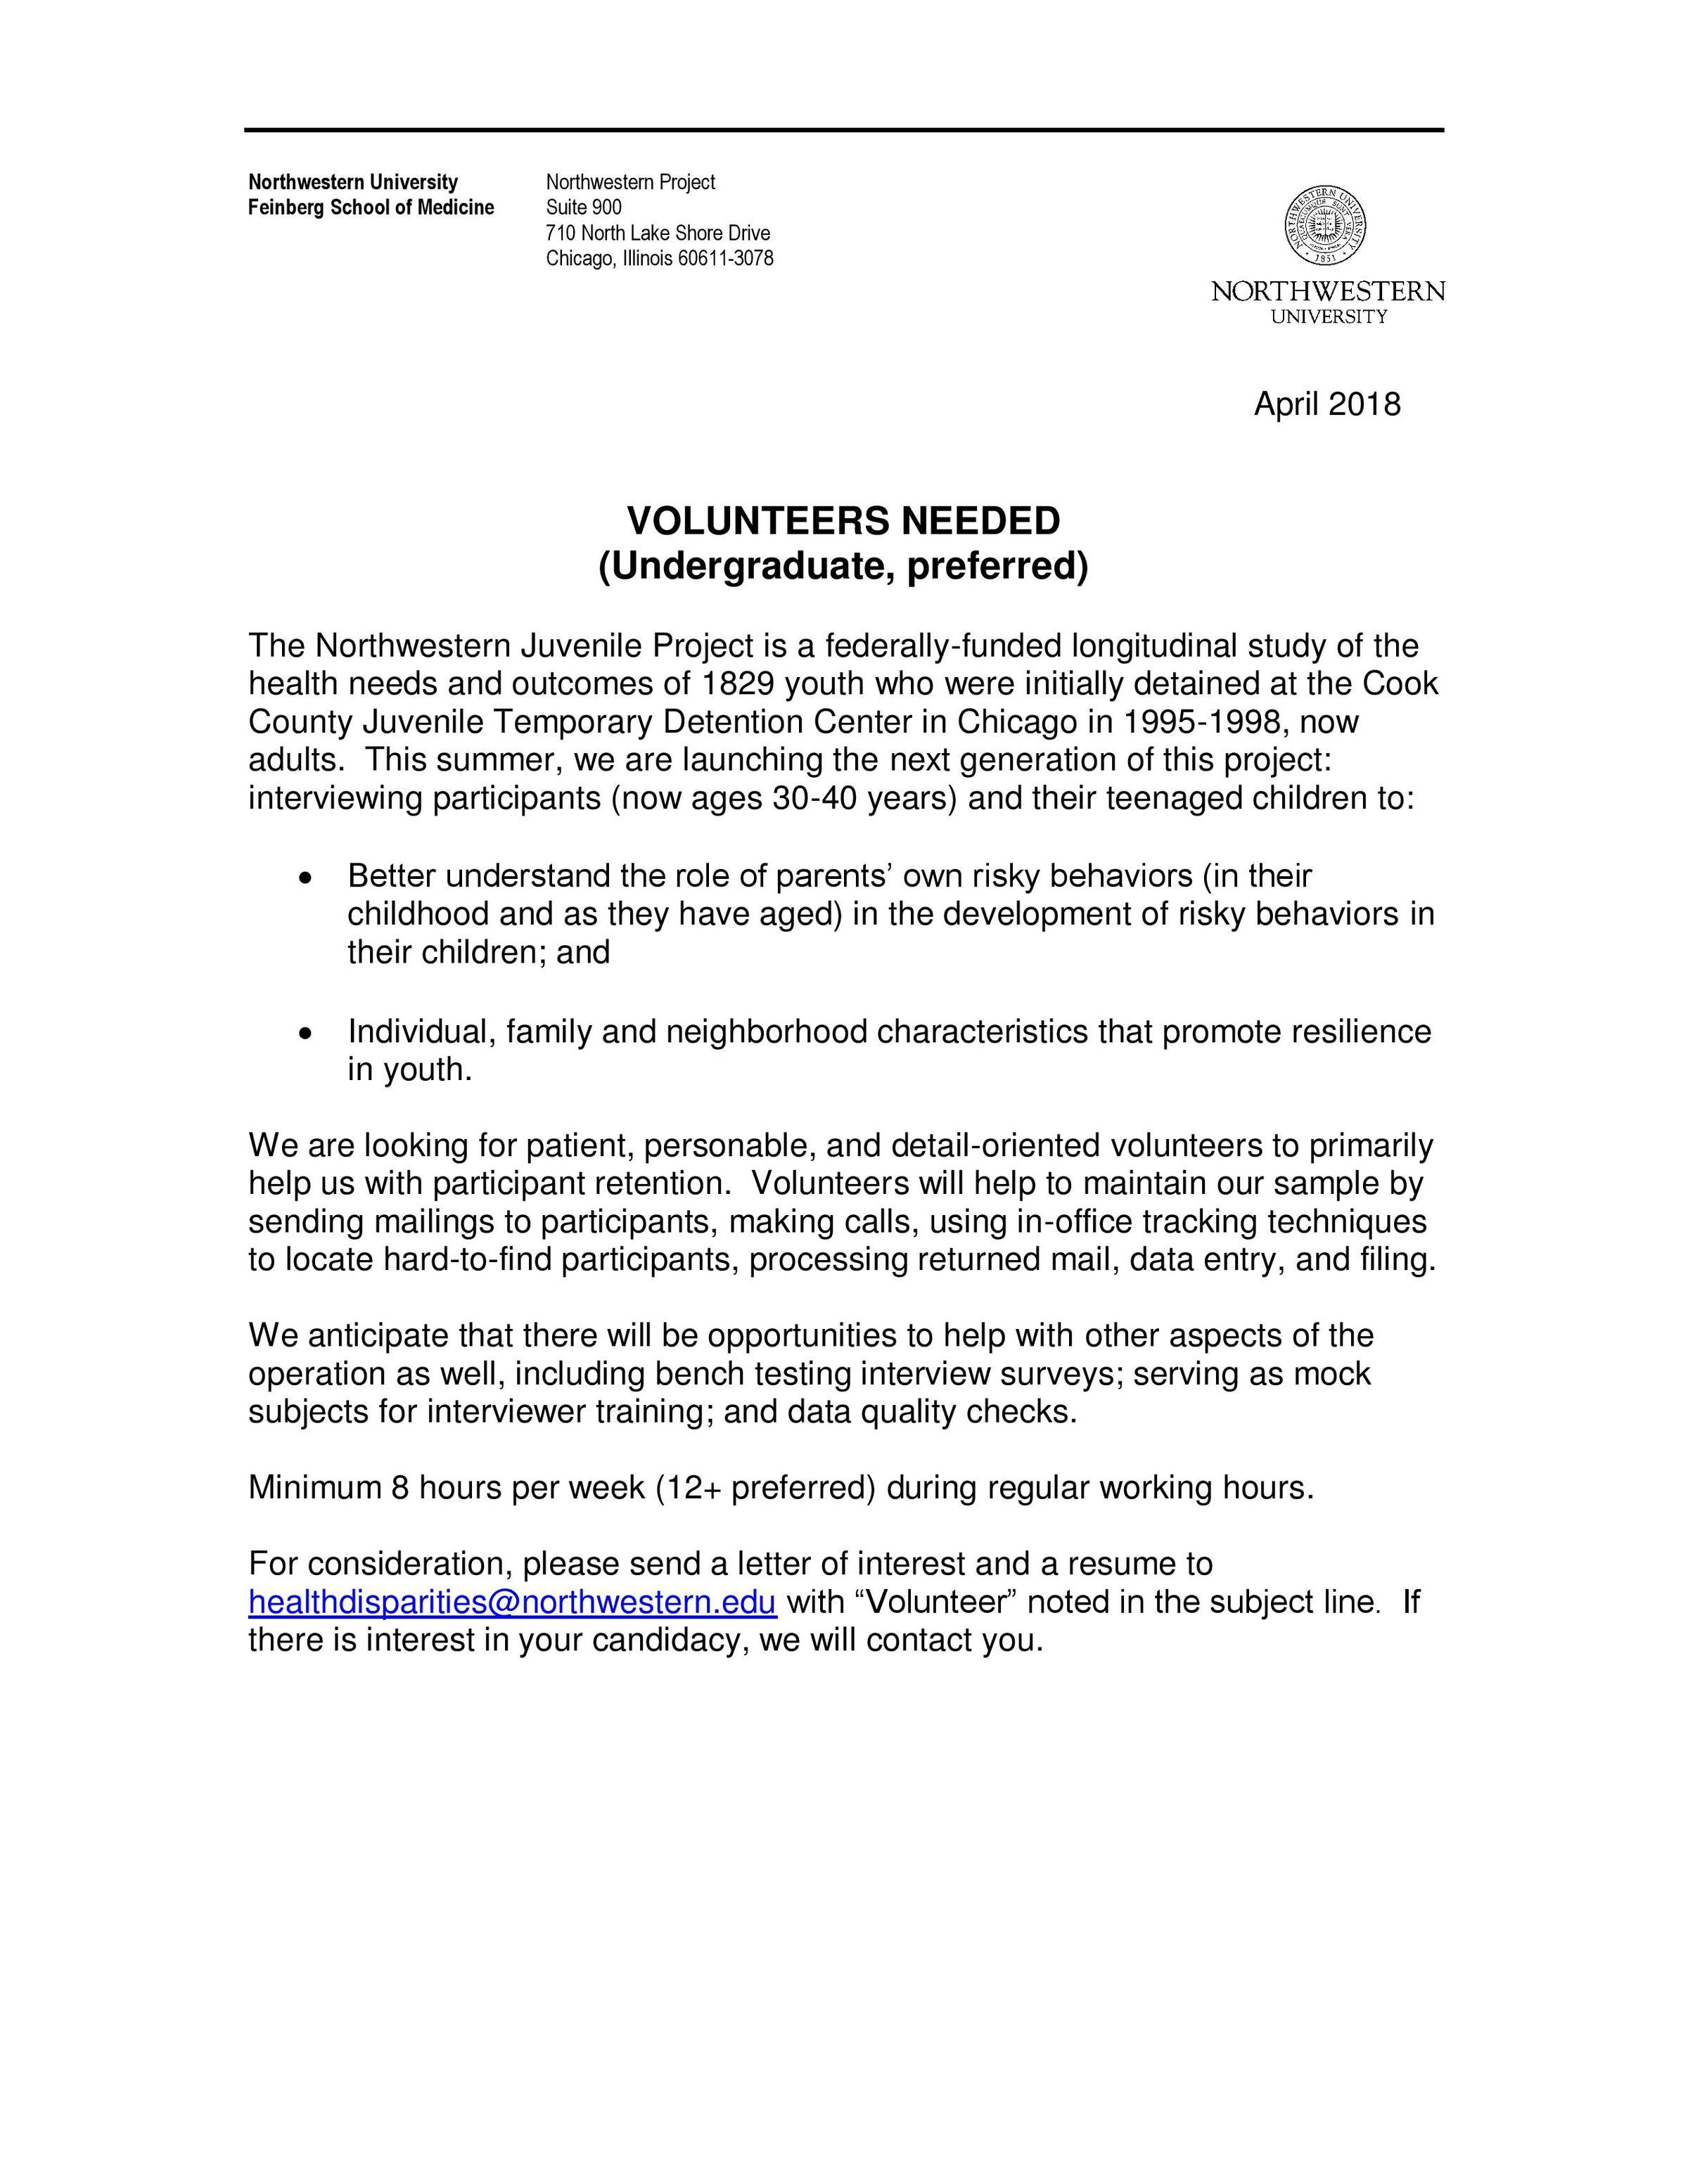 Summer Volunteer Opportunity at Northwestern University